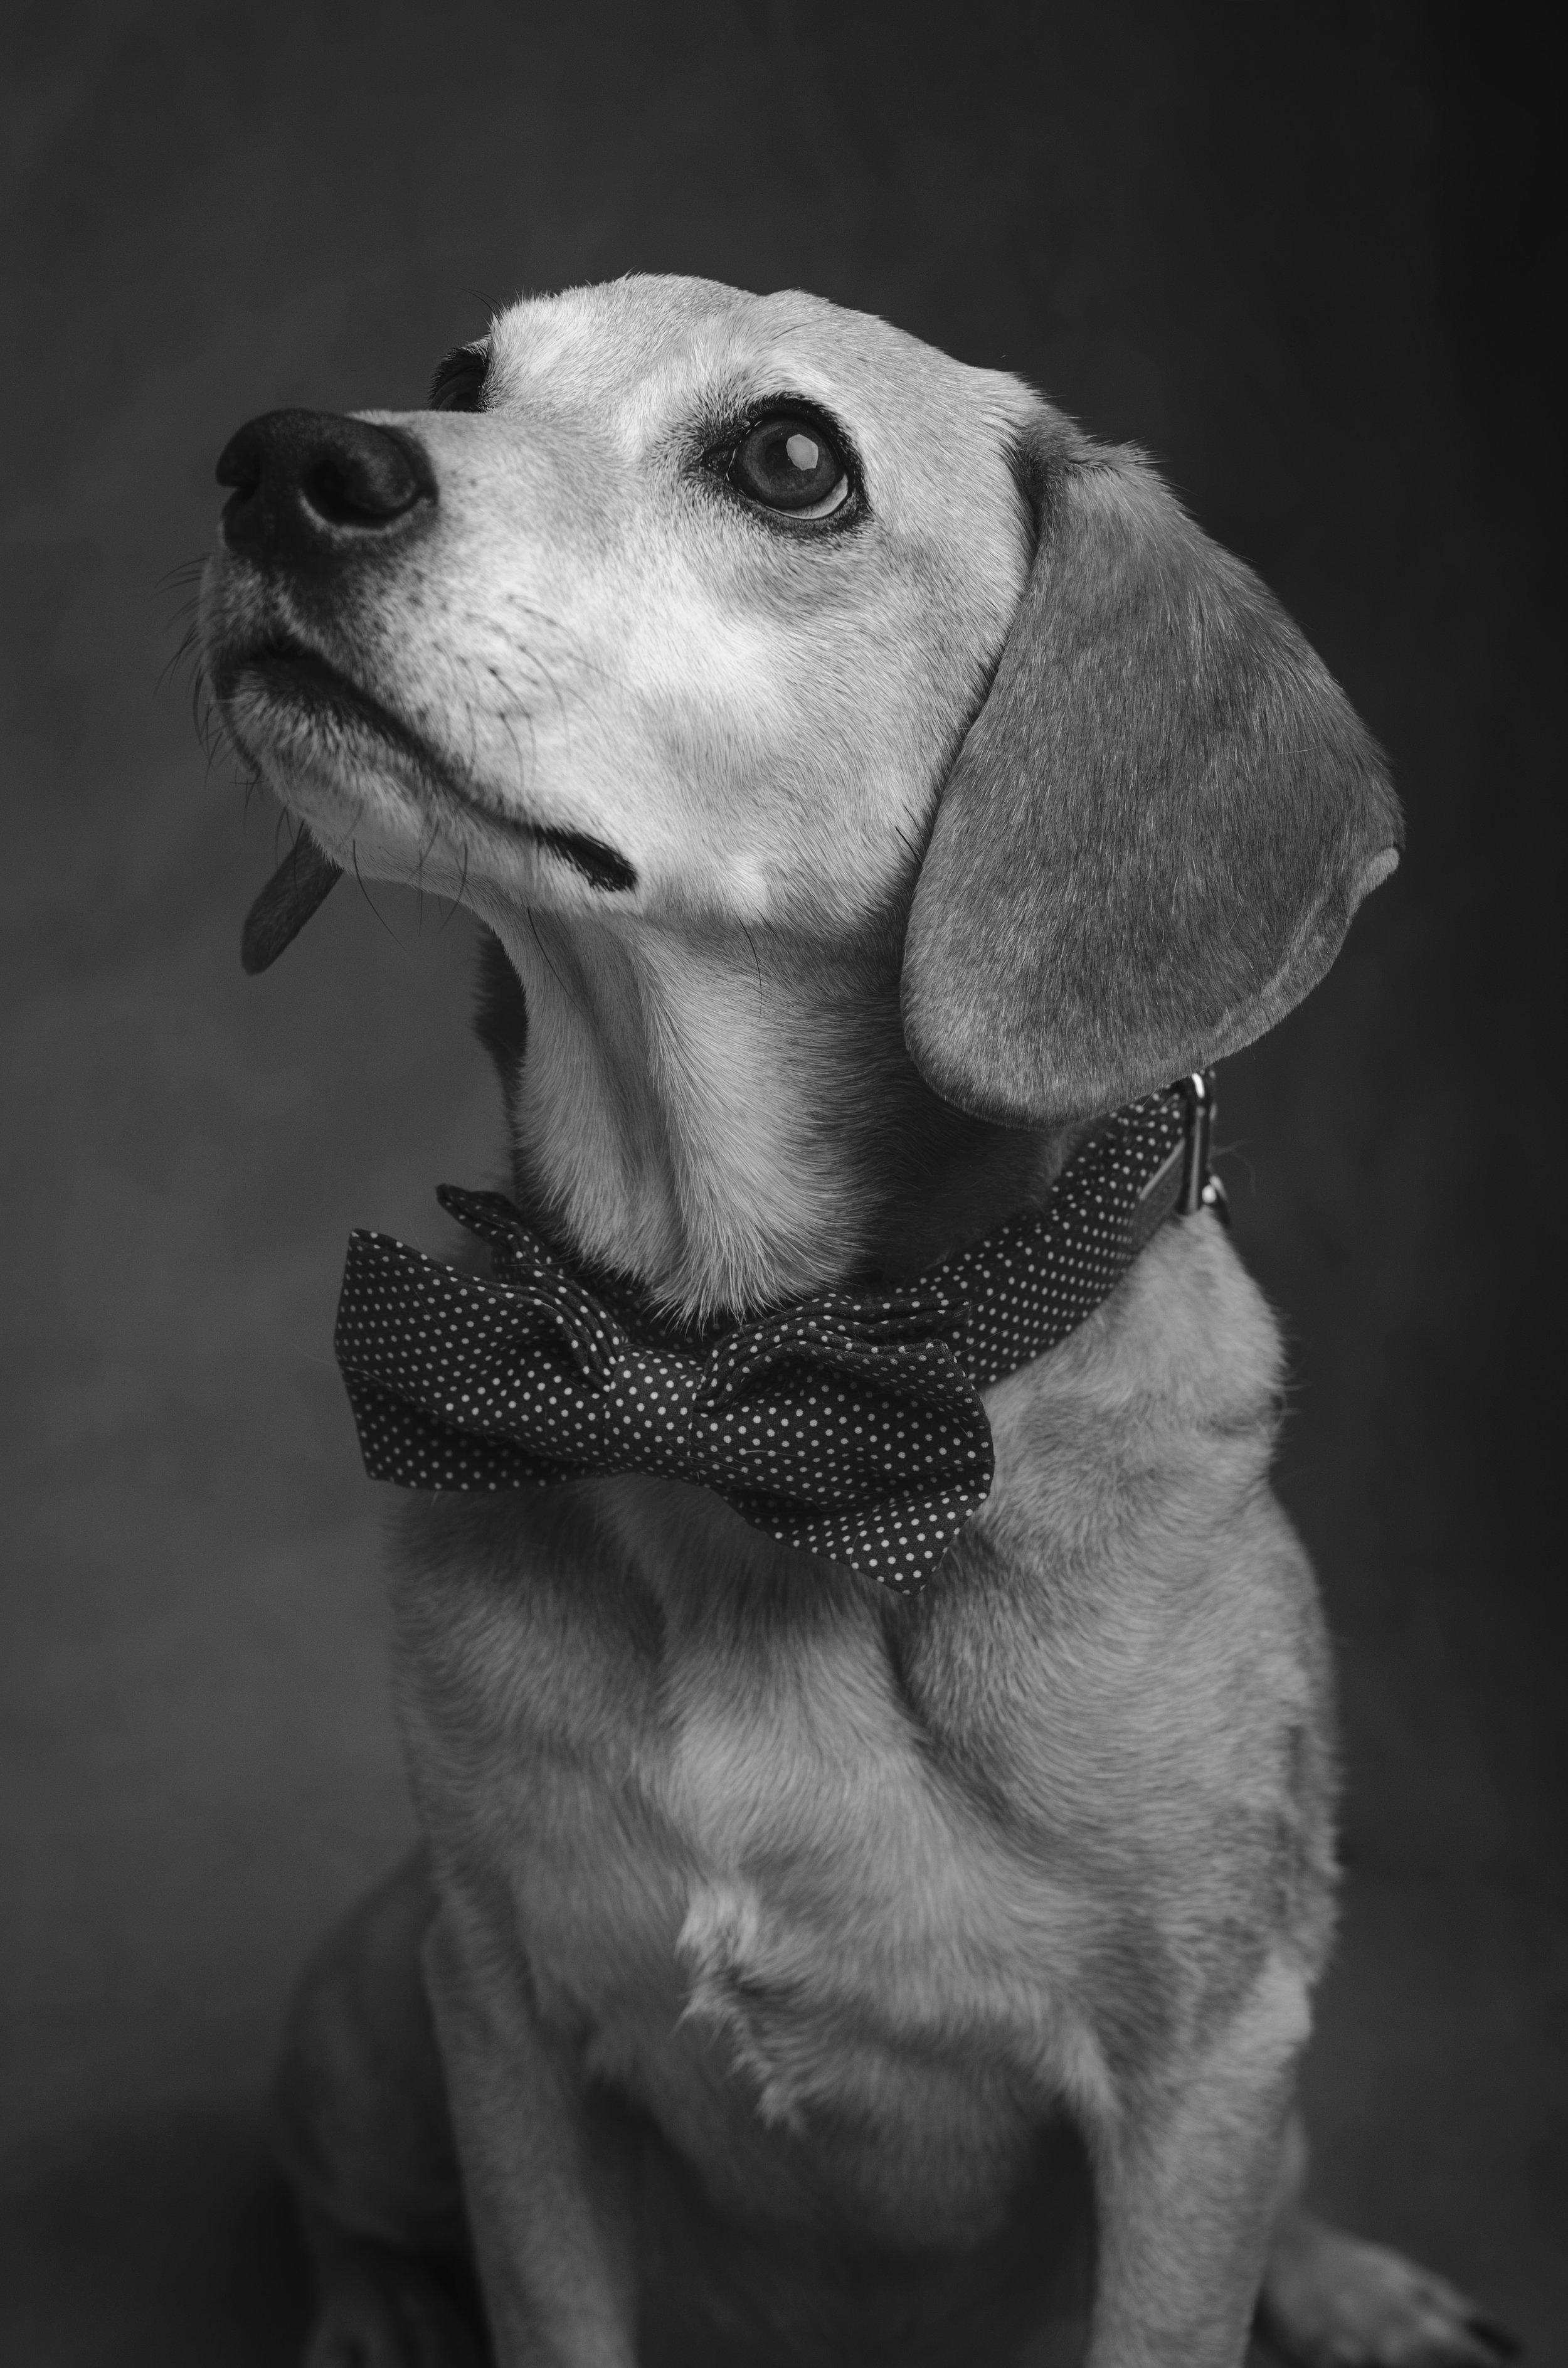 Laura's dog, Charlie